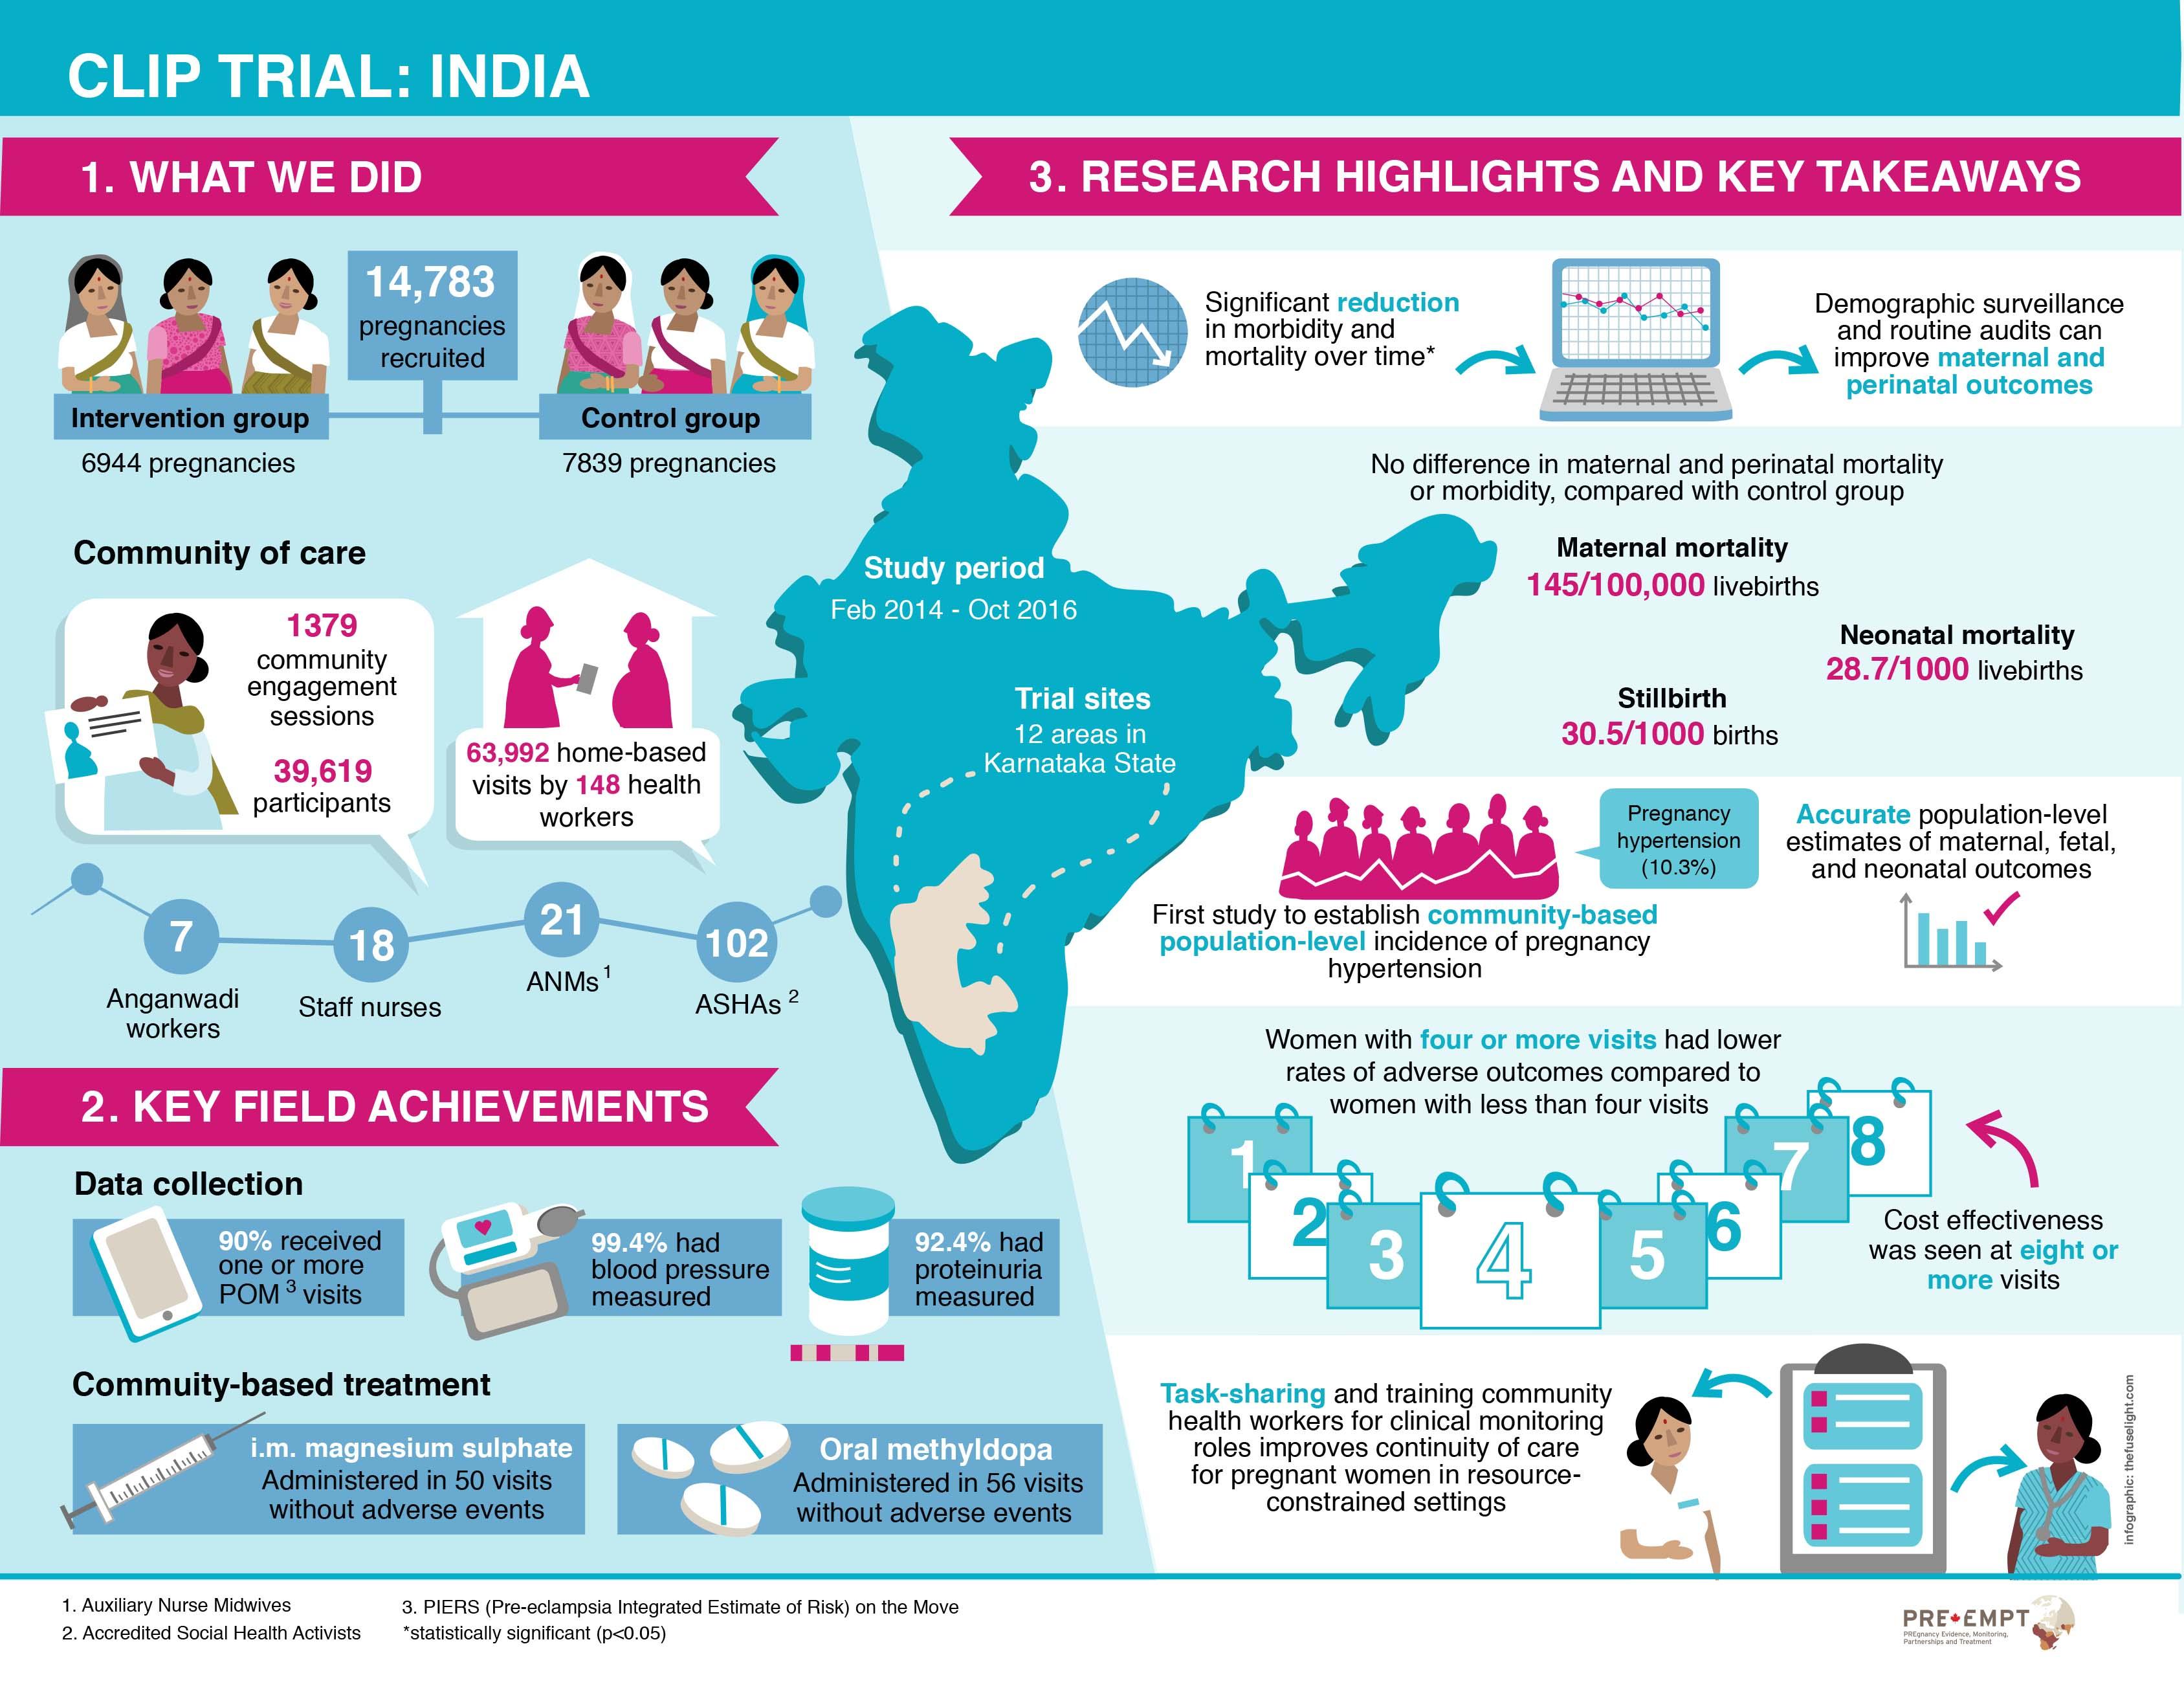 infographic, visual science, preeclampsia, PRE-EMPT, India preeclampsia